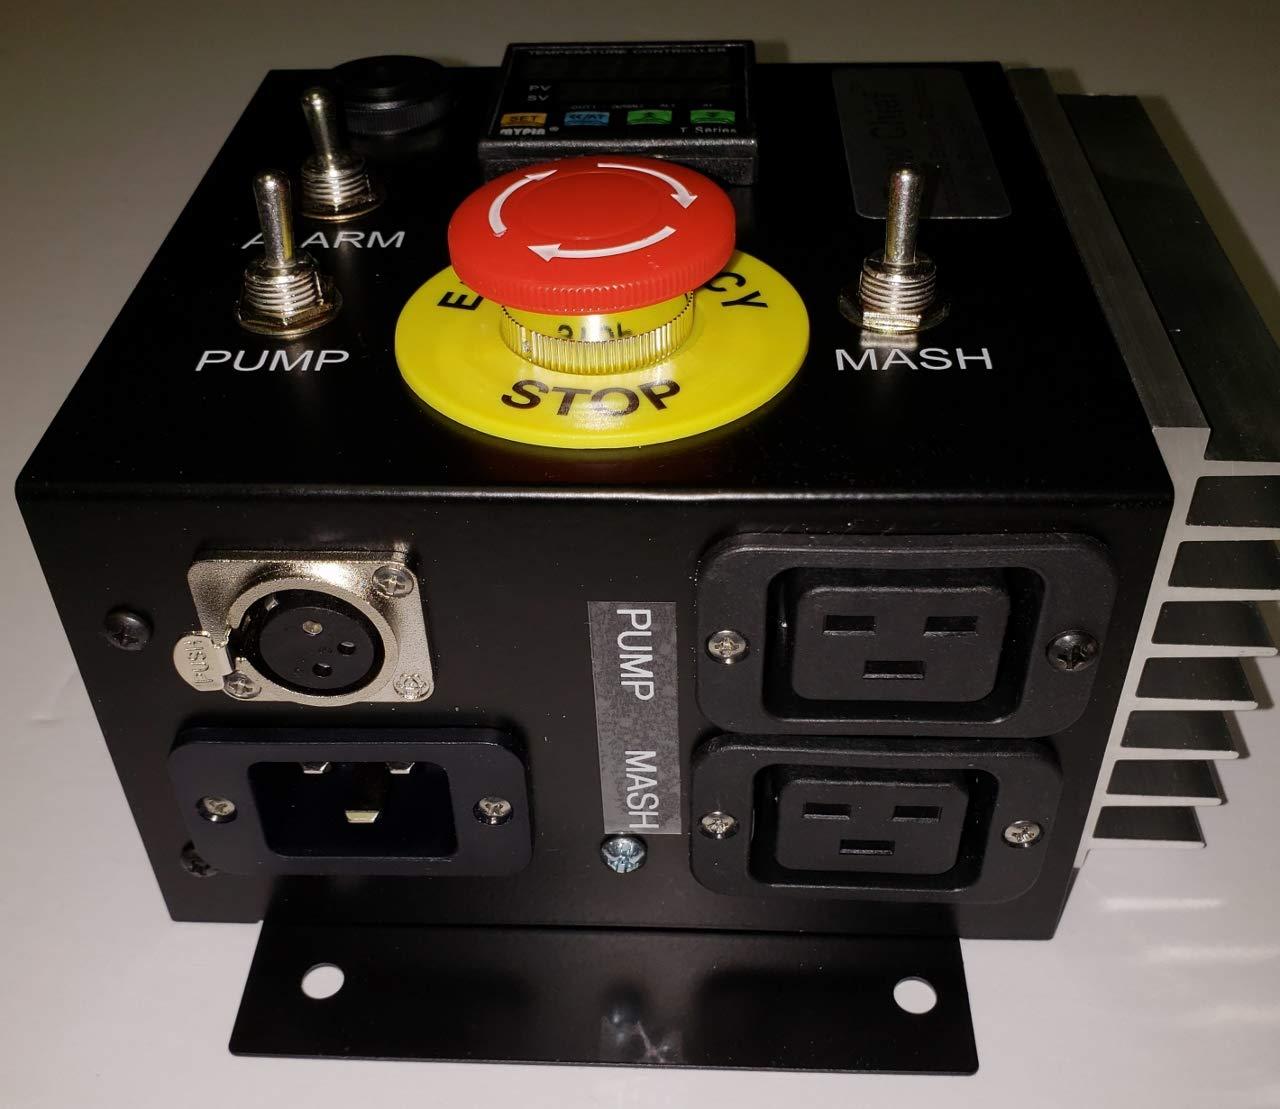 International 220/230/240v 50/60 Hz Mash Tun/RIMS (Recirculating Infusion Mash System) Tube Controller by Stir-Plate (Image #6)